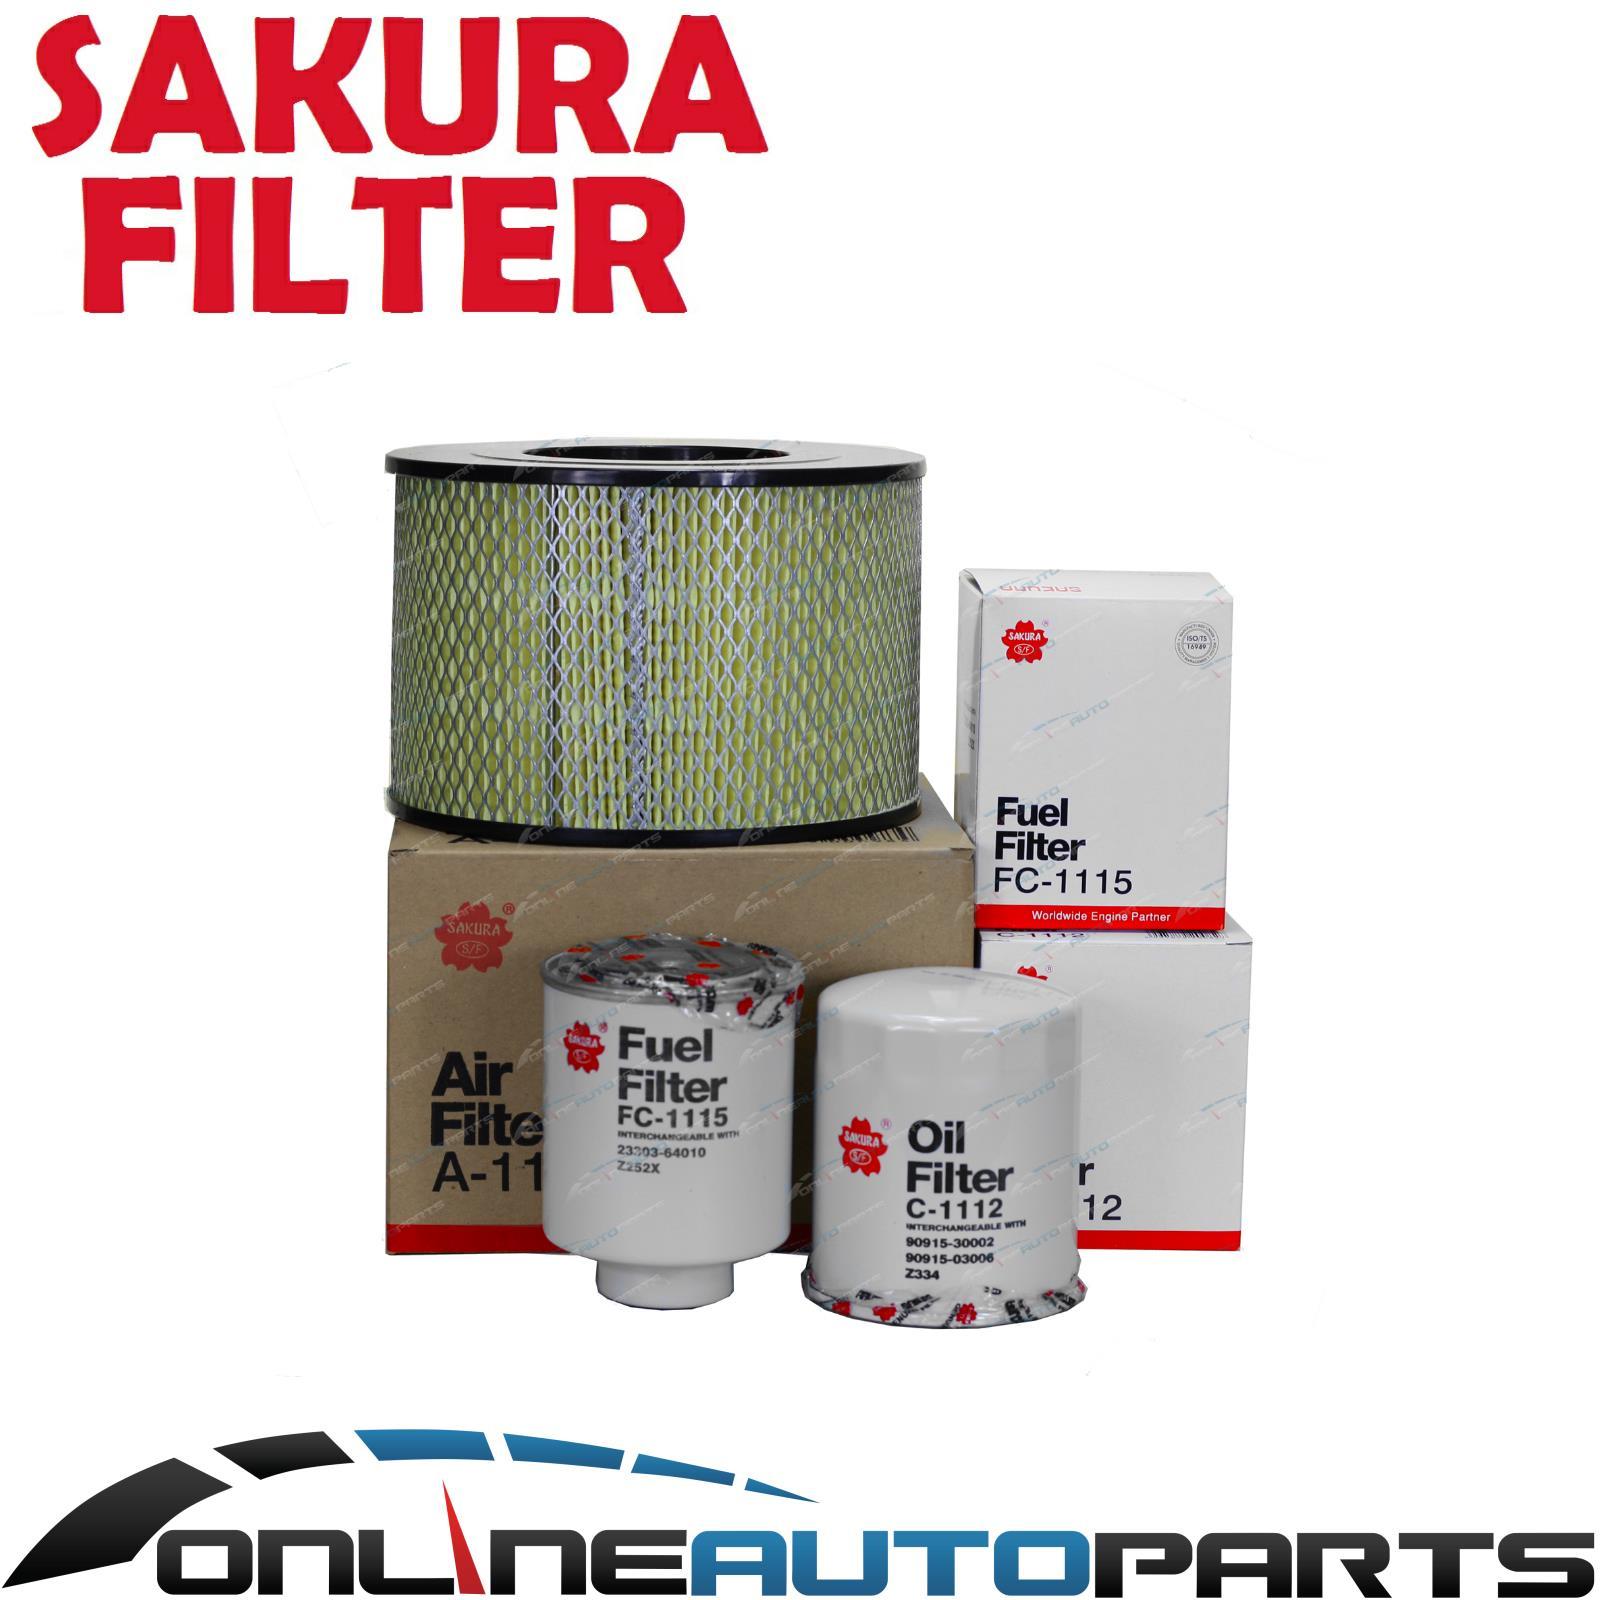 Air Oil Fuel Filter Service Kit Suits Toyota Diesel Hzj75 Hzj78 Engine Hzj79 Hzj80 1hz